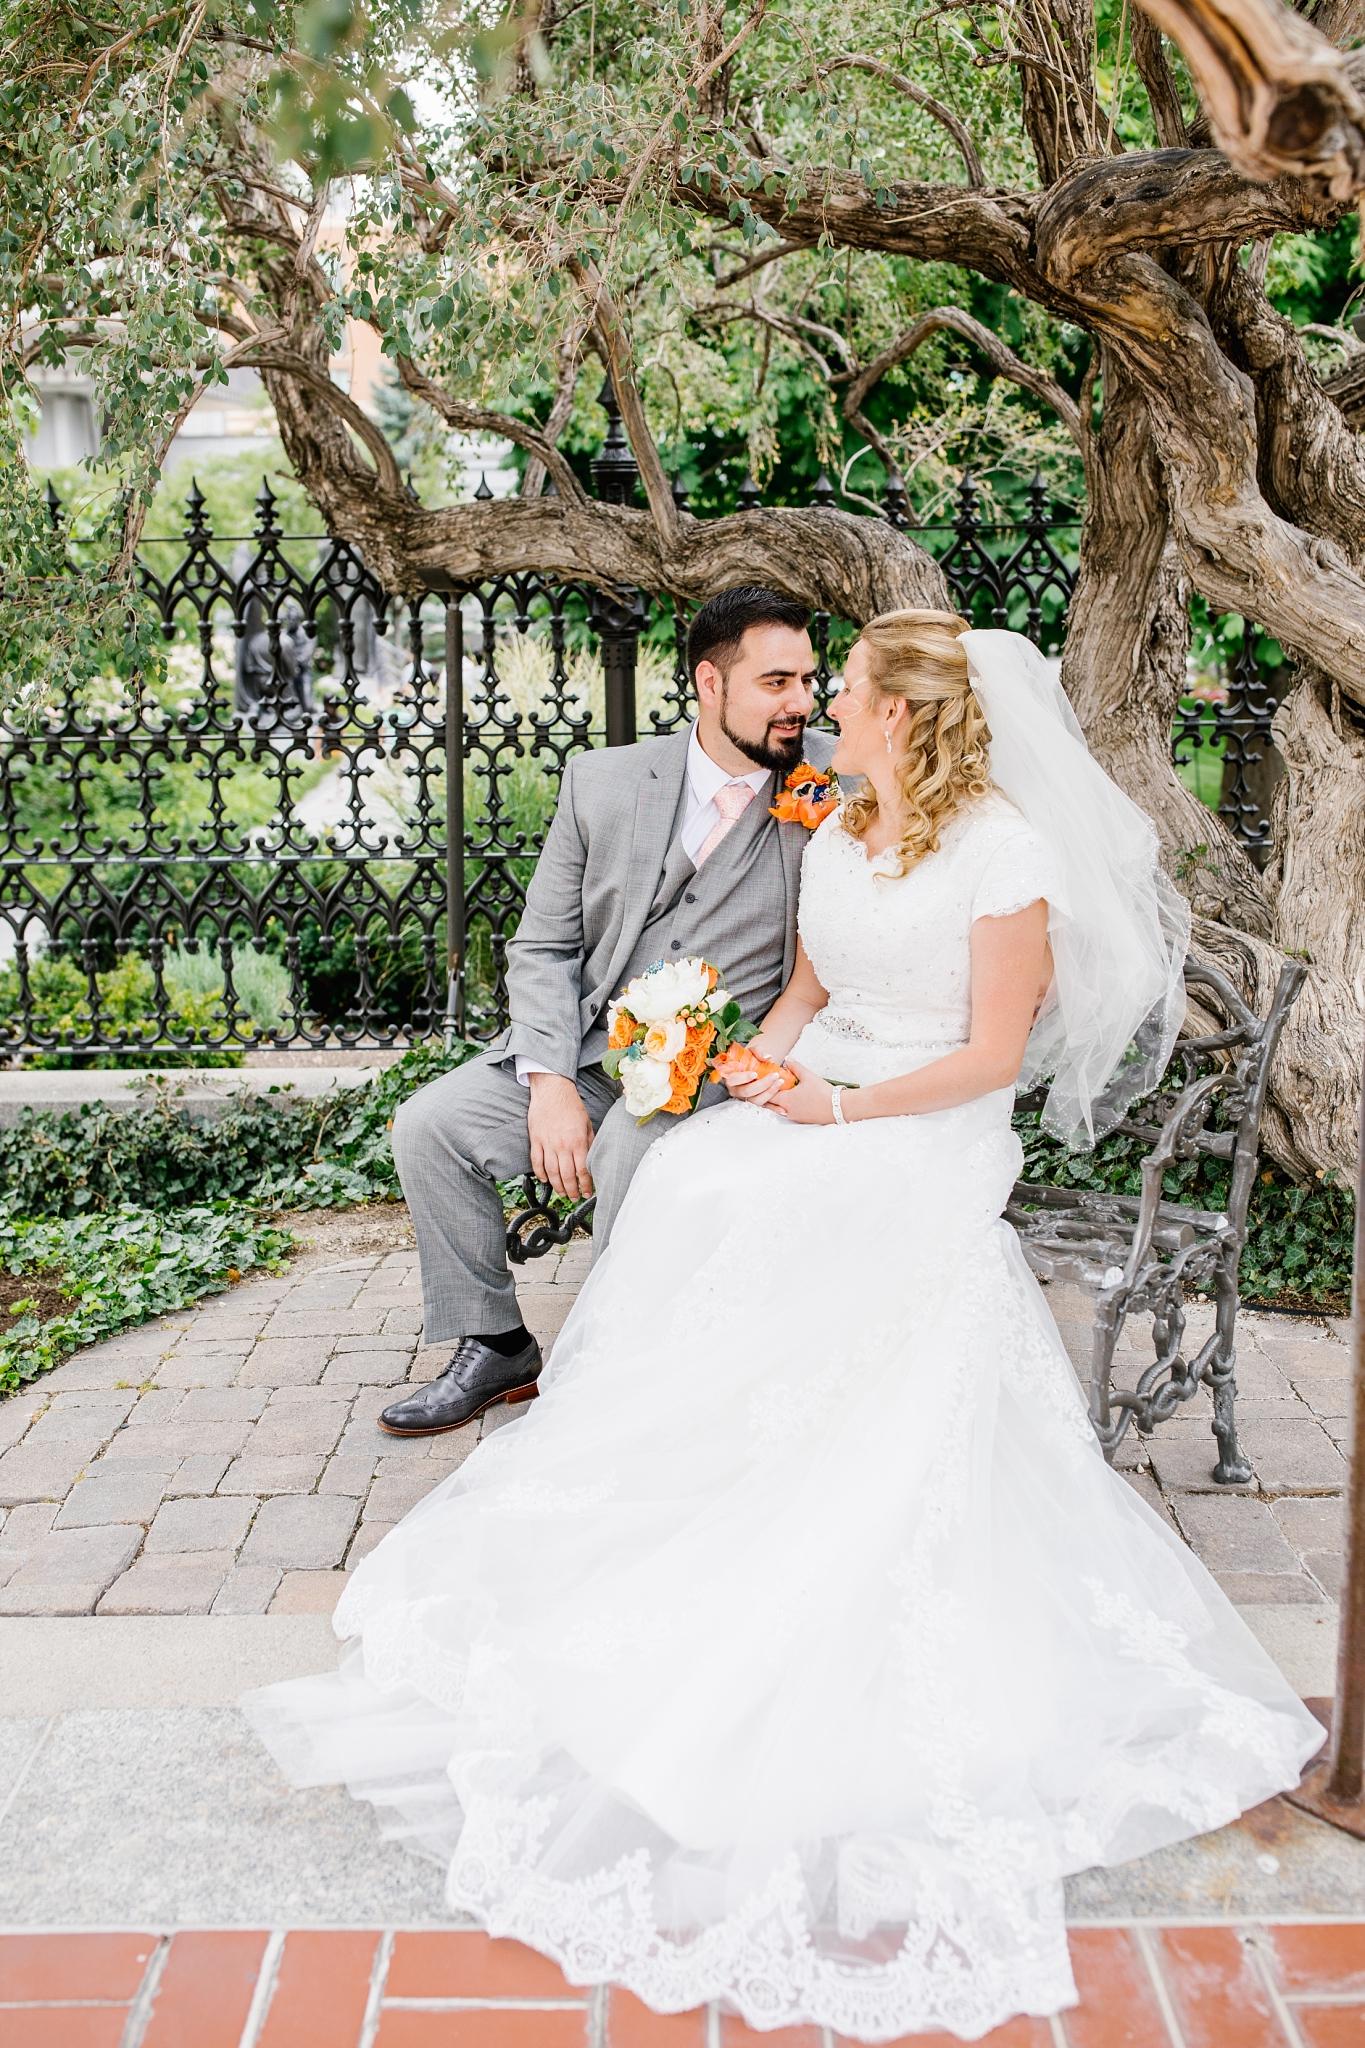 Justin and Melissa-136_Lizzie-B-Imagery-Utah-Wedding-Photographer-Salt-Lake-City-Temple-Photographer-Lion-House-Luncheon-The-Grand-Ballroom-Bountiful.jpg